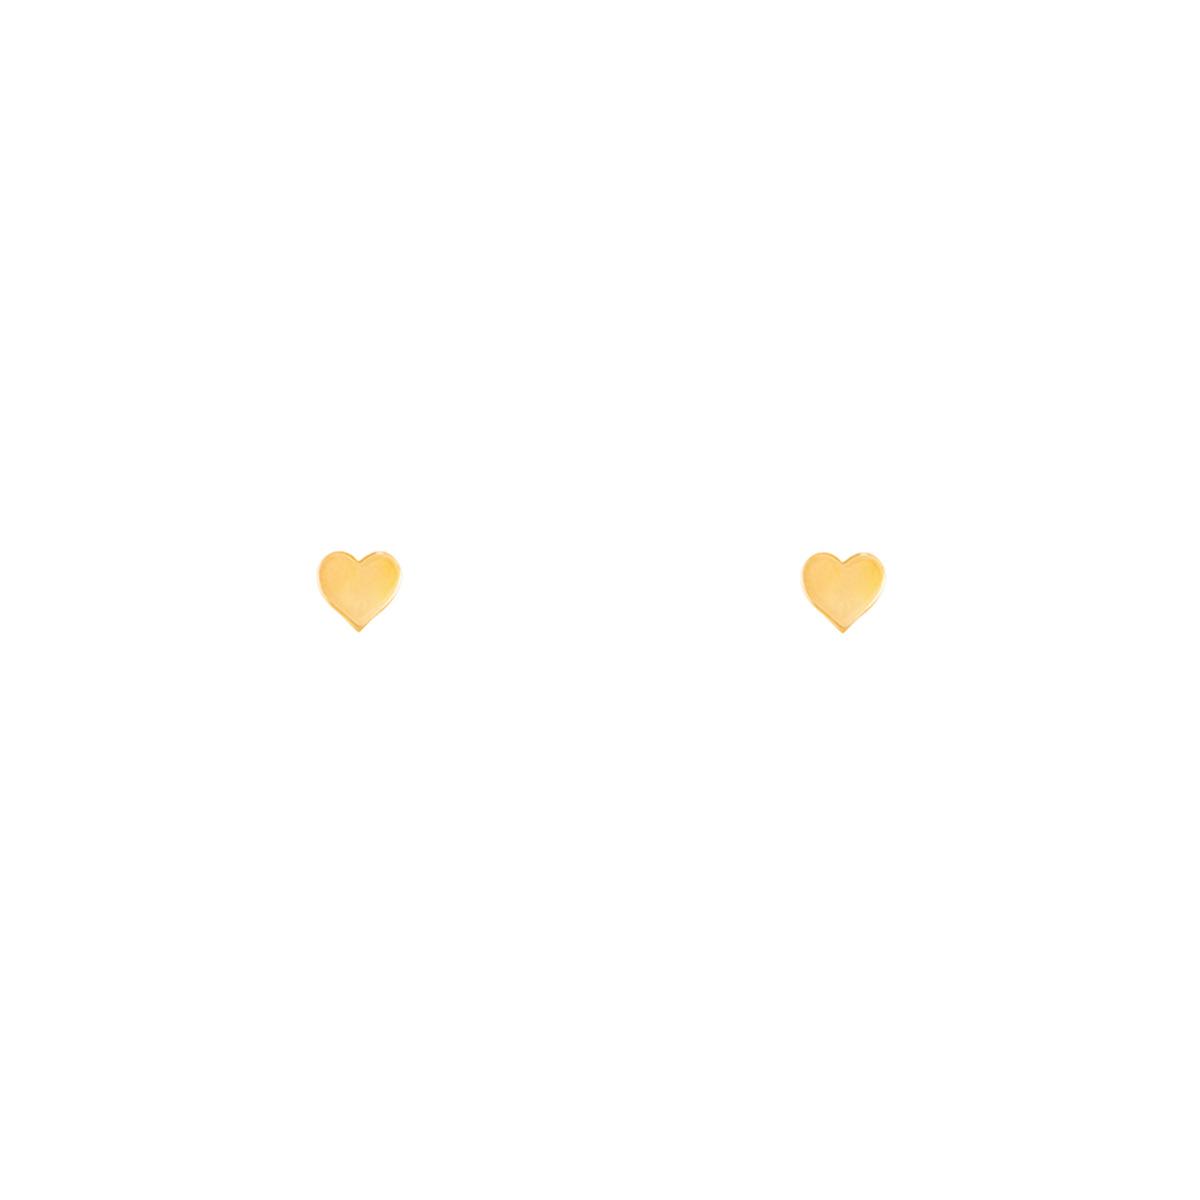 گوشواره طلا قلب کوچک